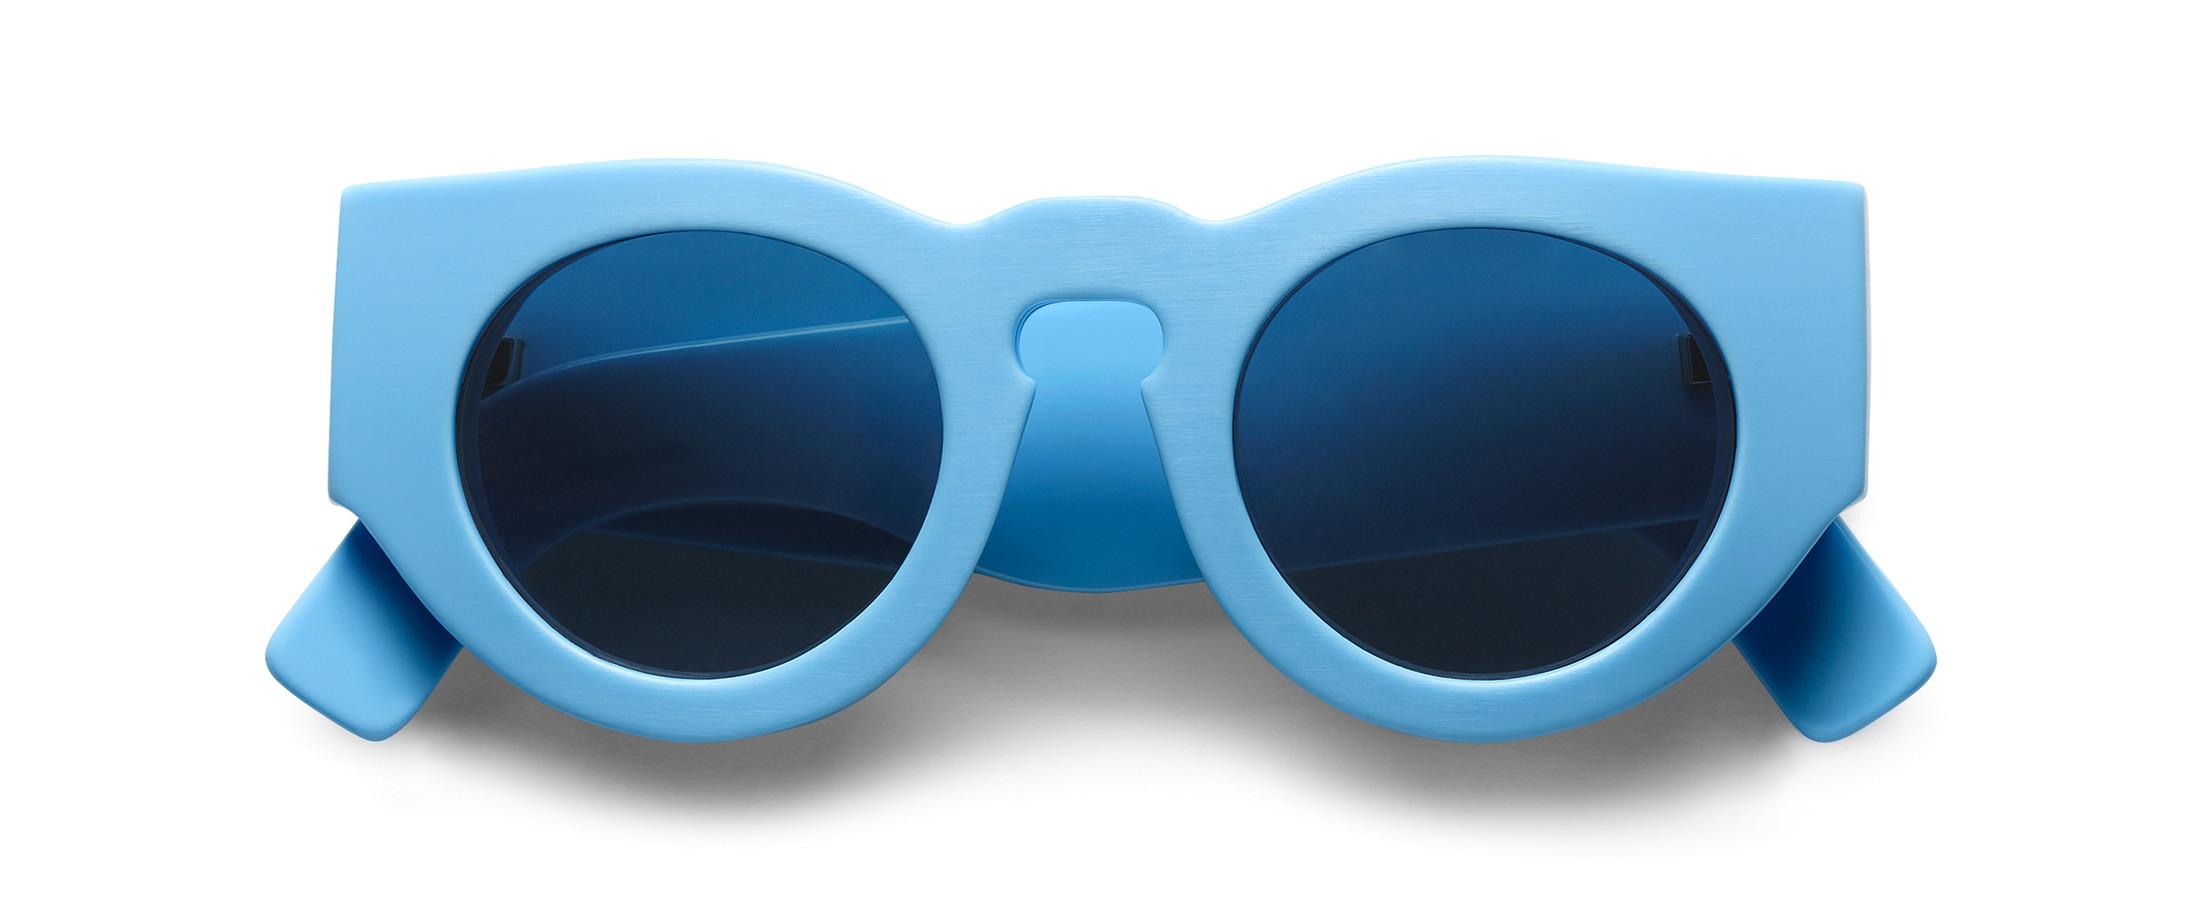 acne studios bleu